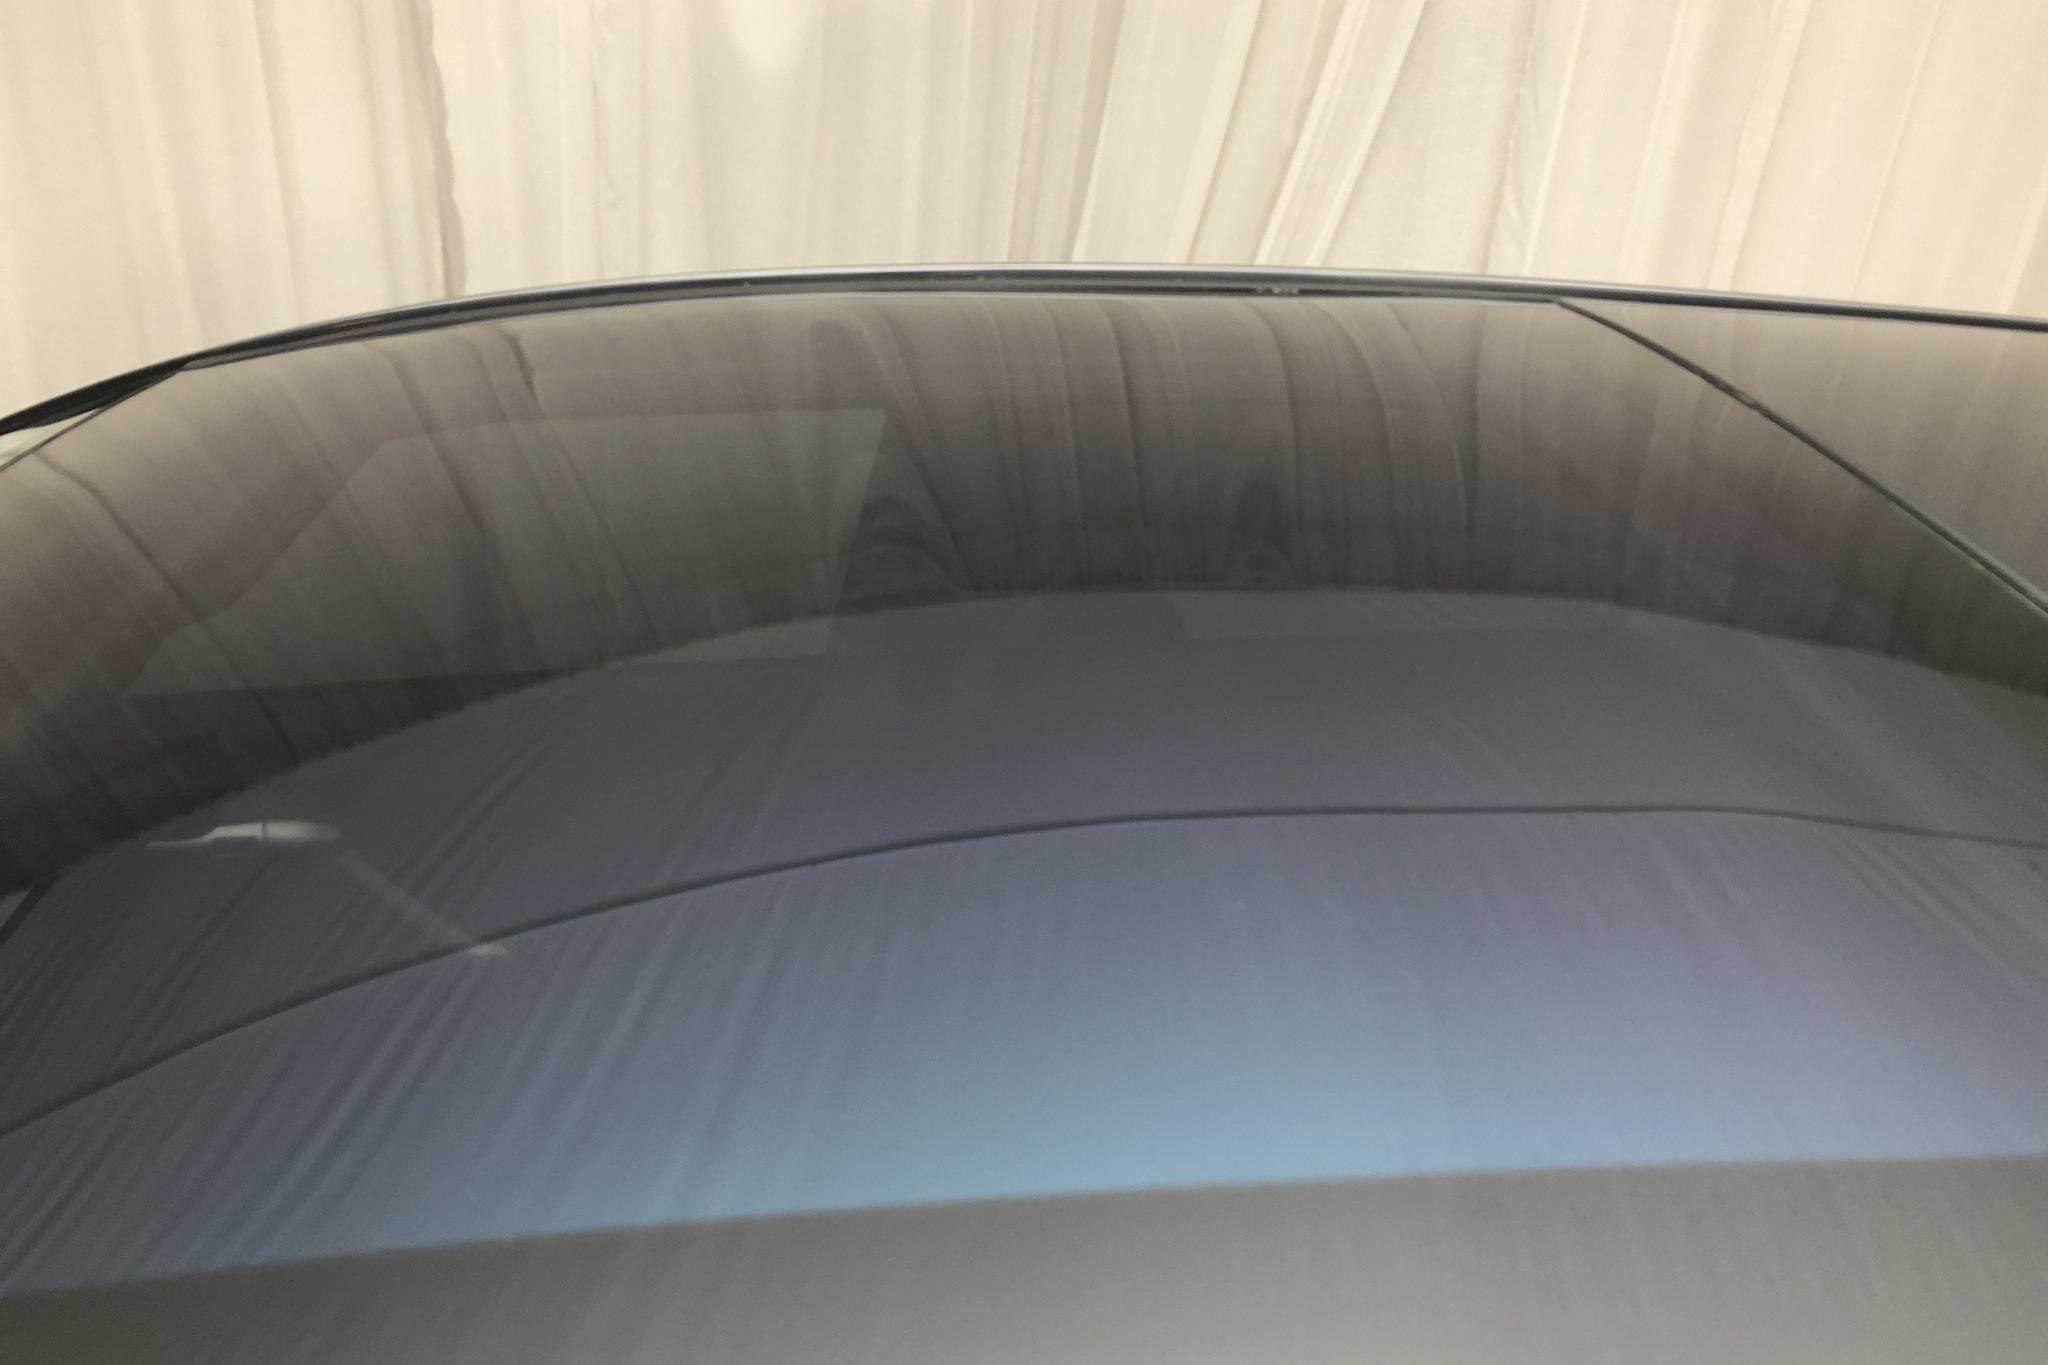 Toyota Verso 1.8 (147hk) - 14 262 mil - Manuell - Dark Grey - 2010